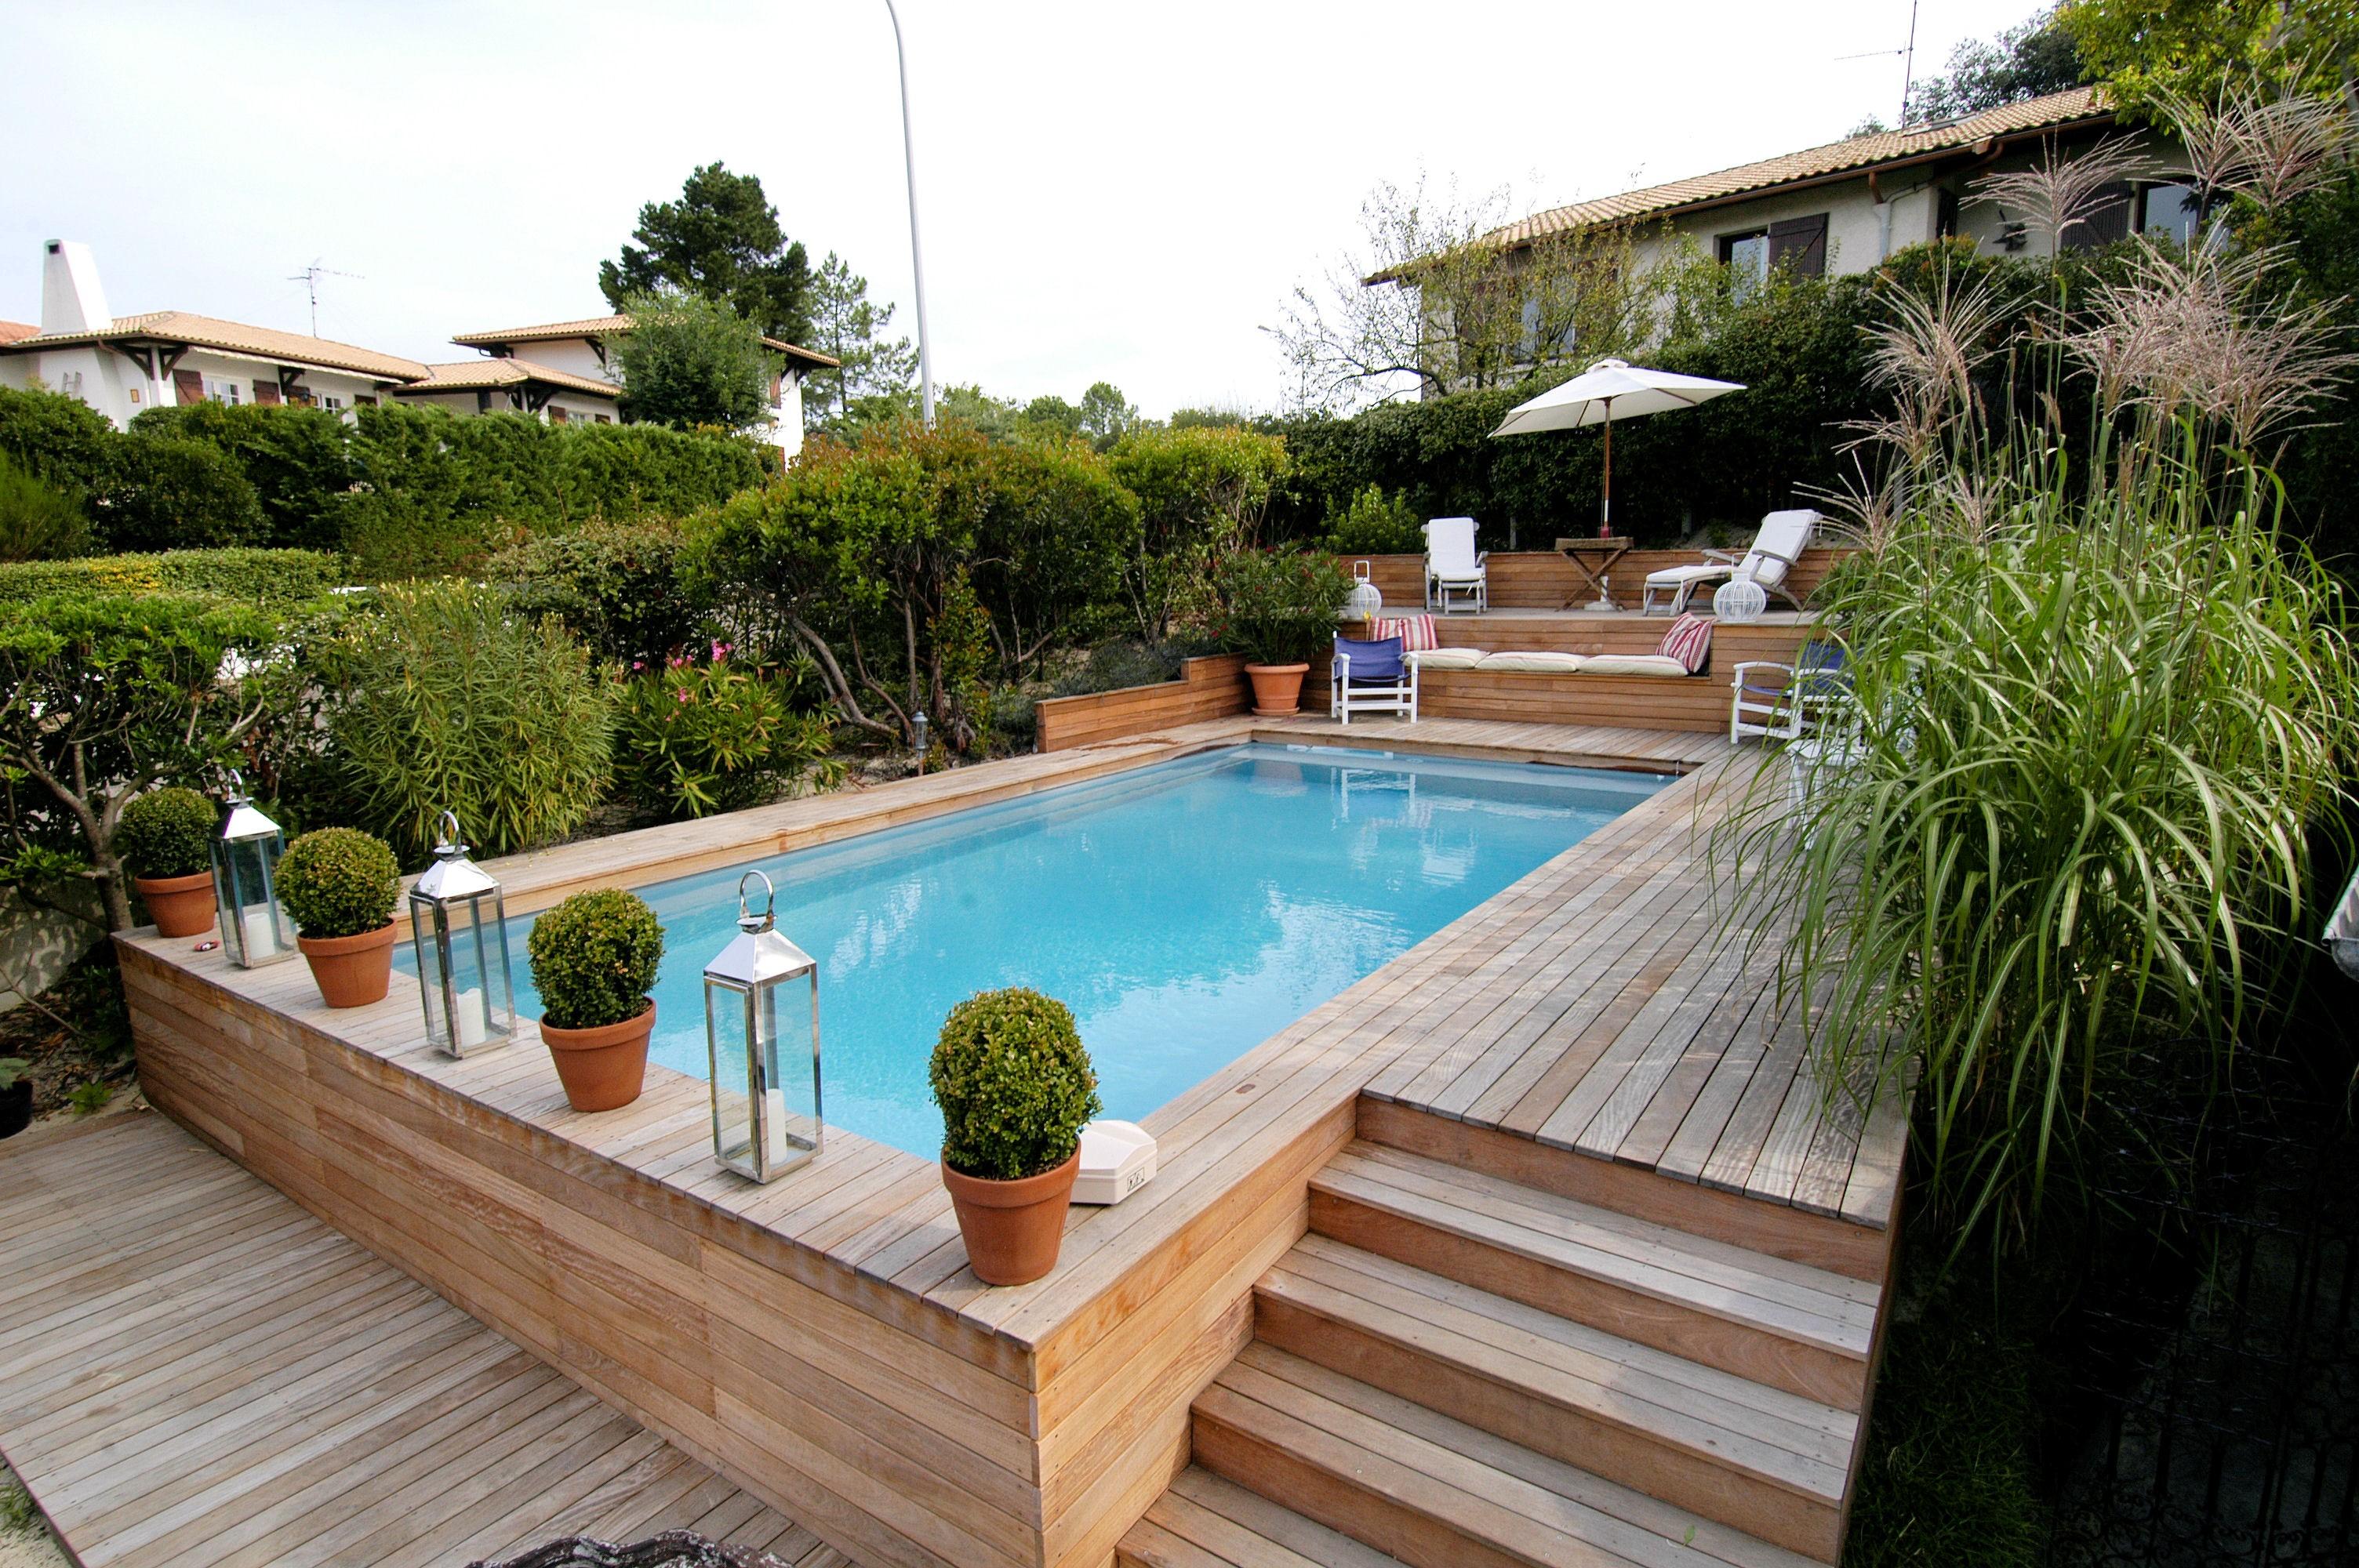 Terrasse piscine semi enterree - Prix piscine en bois semi enterree ...